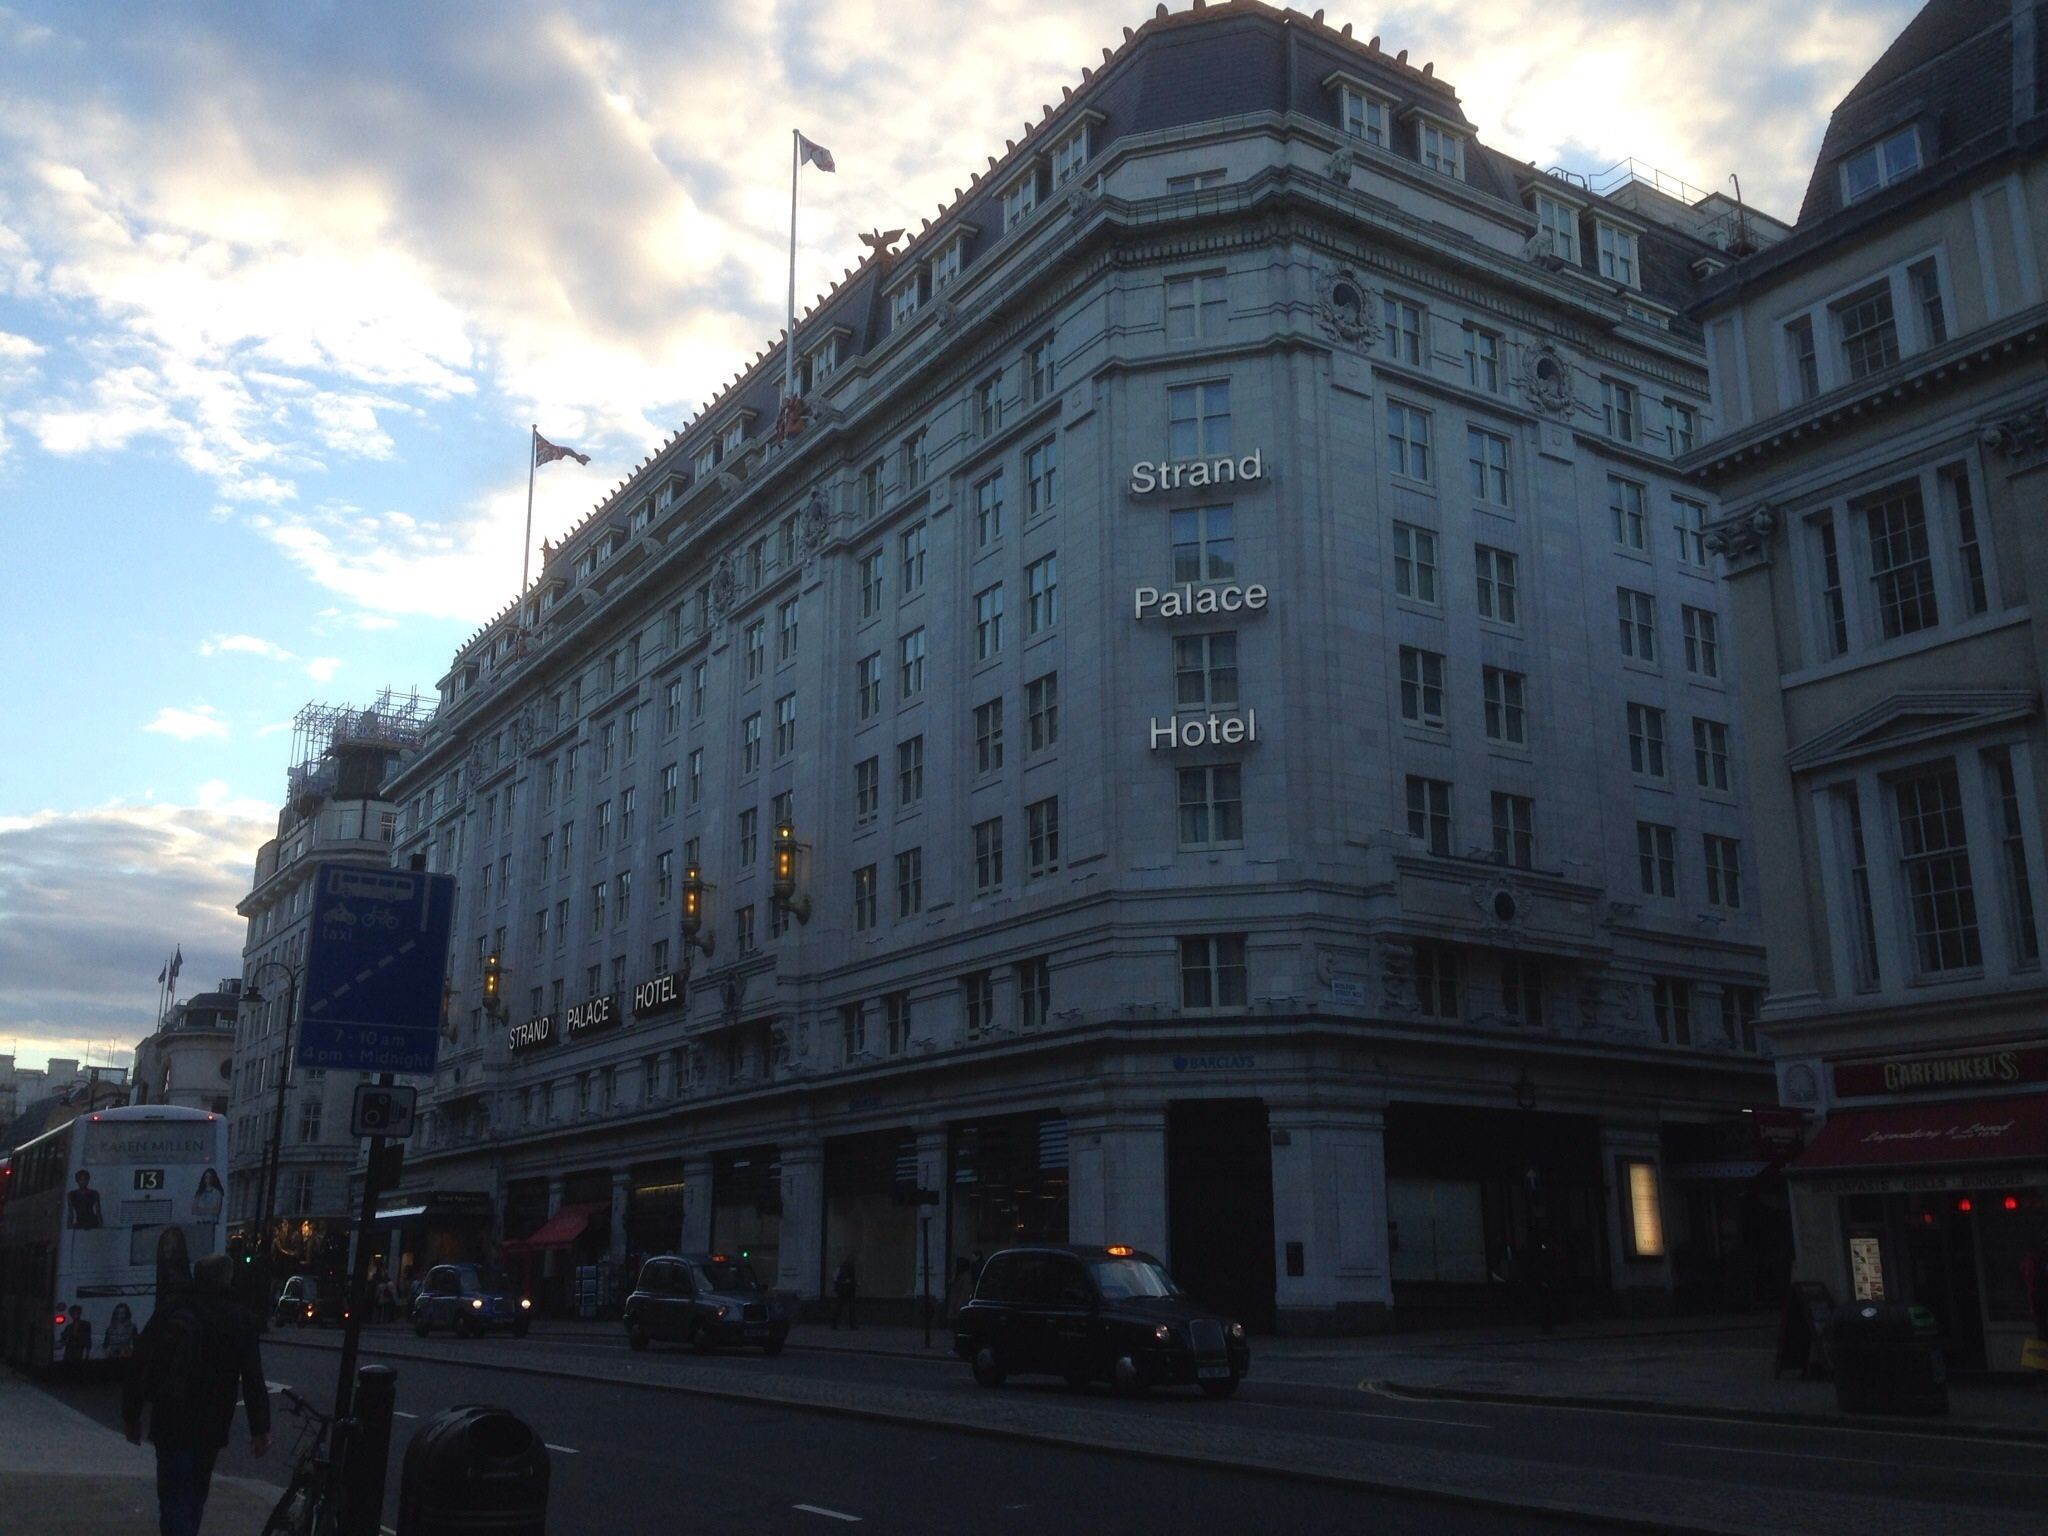 Strand Palace - London, UK